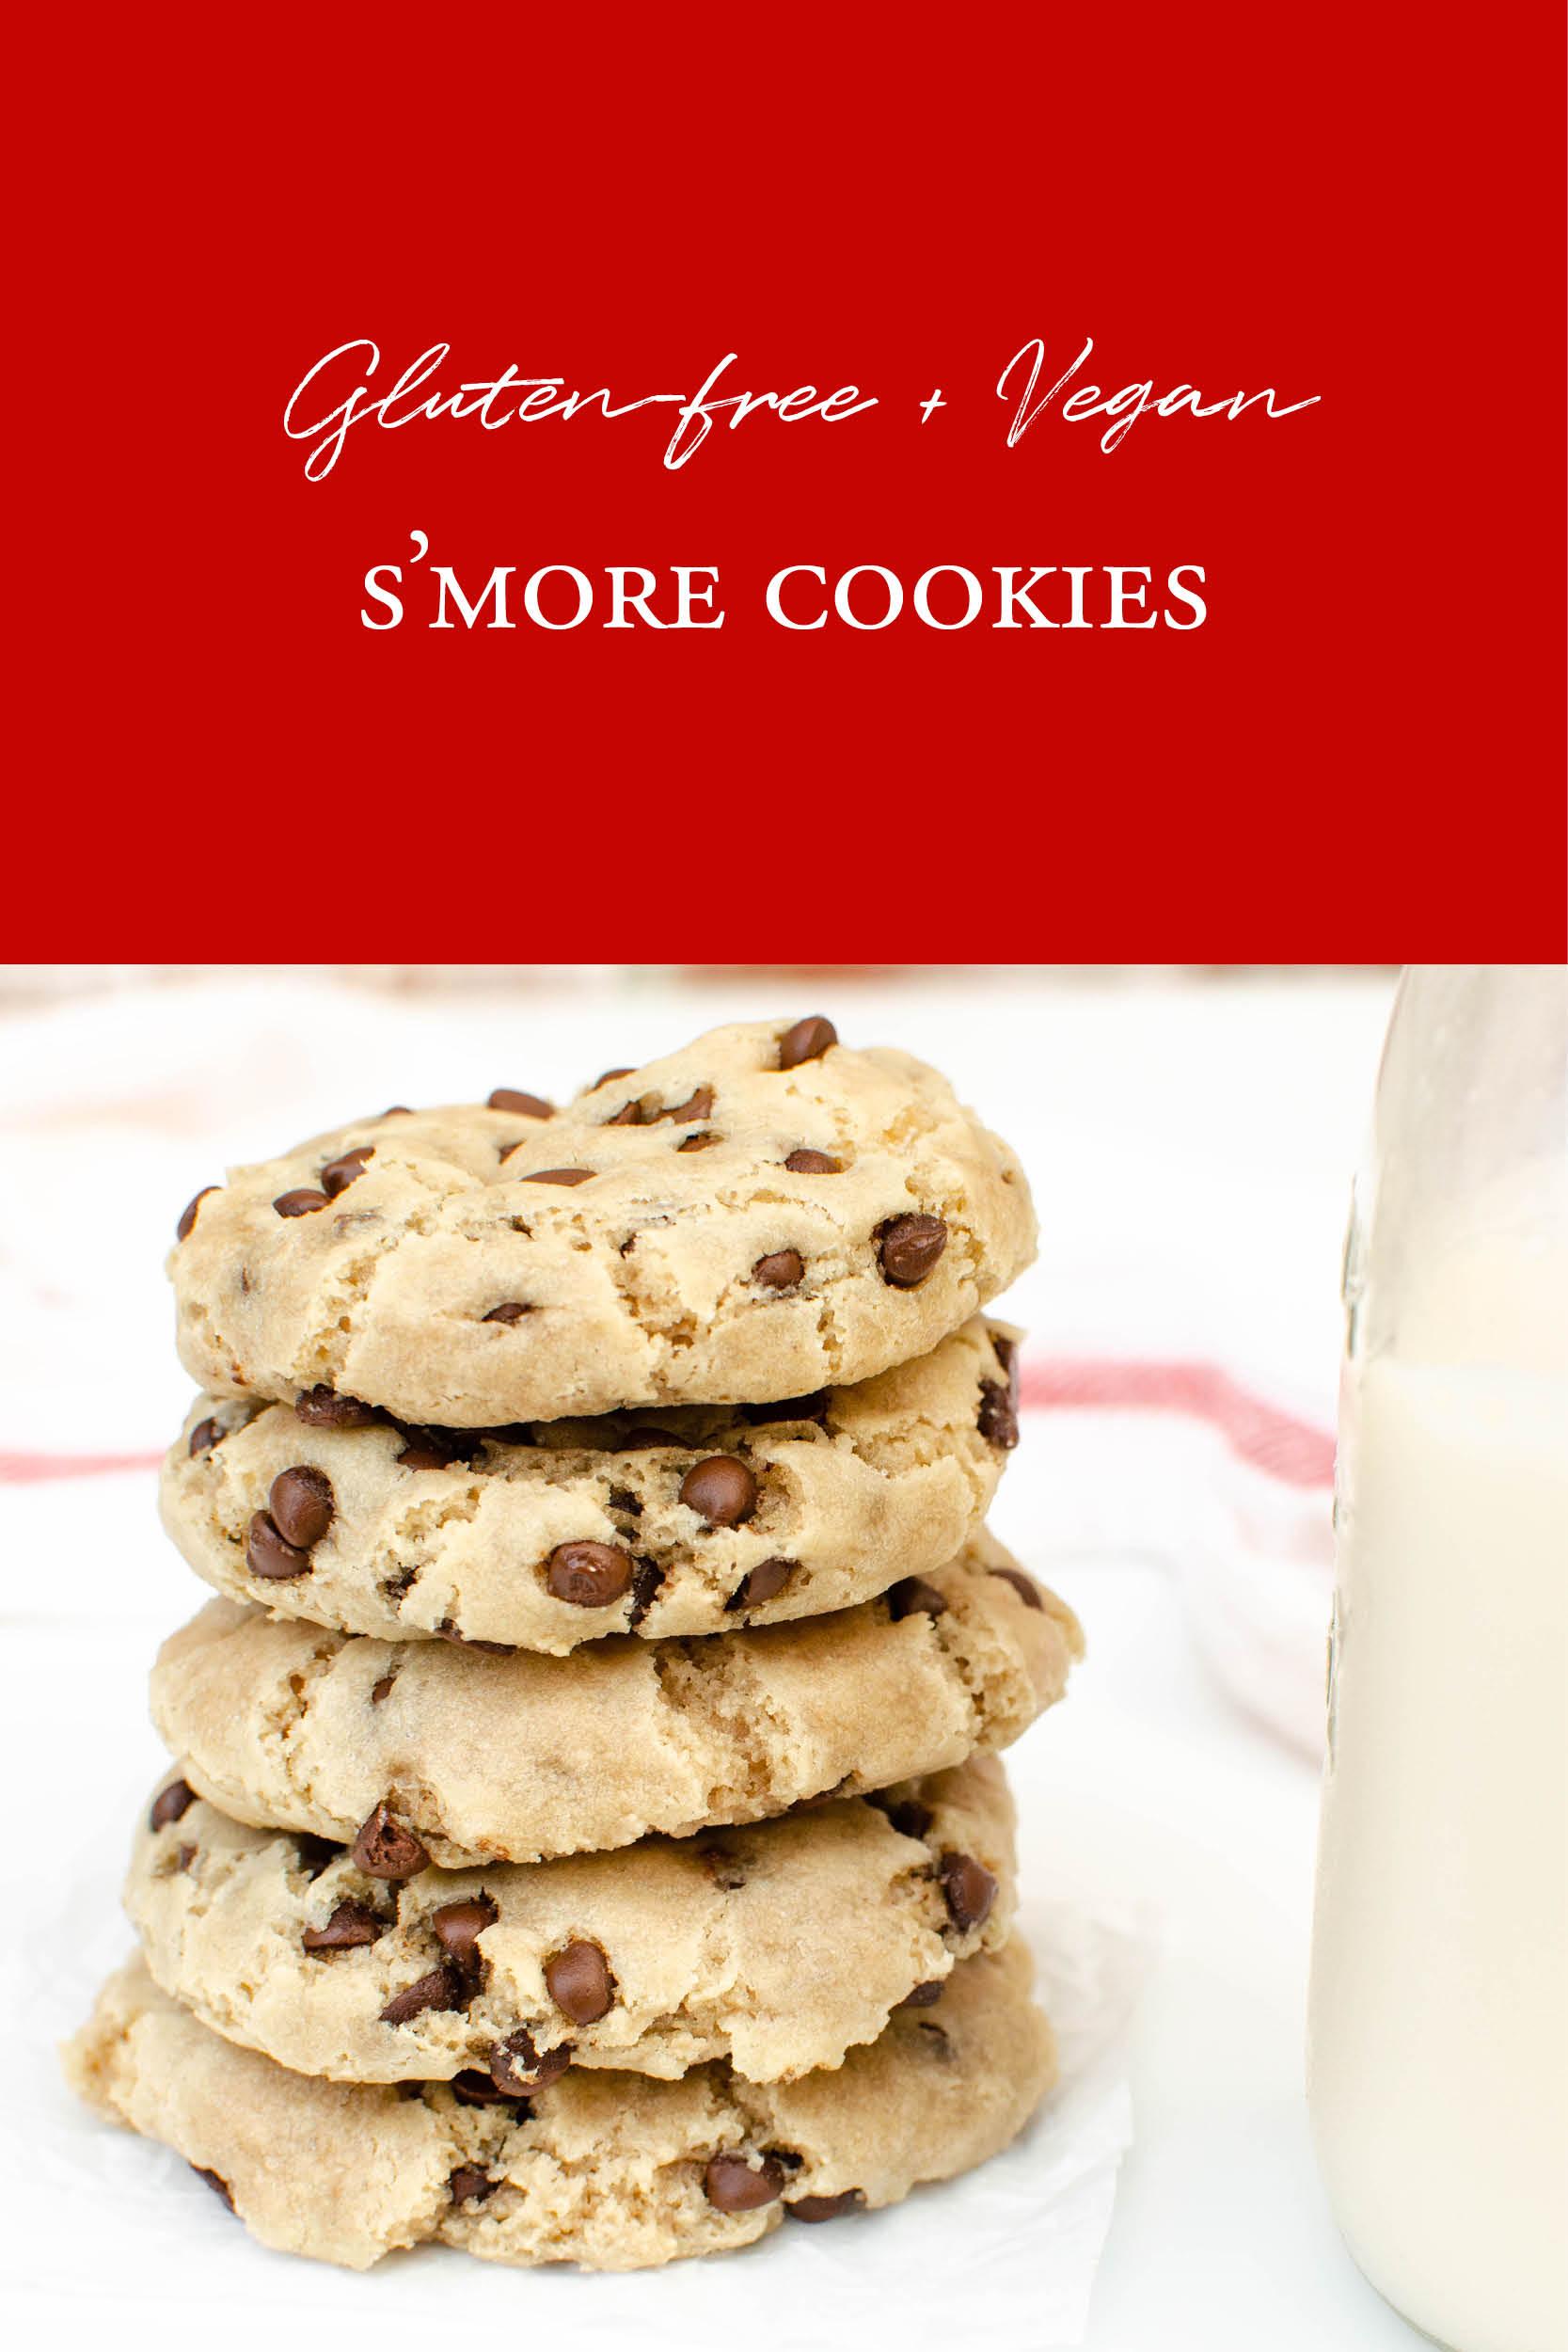 SmoreCookies - Vegan GlutenFree.jpg